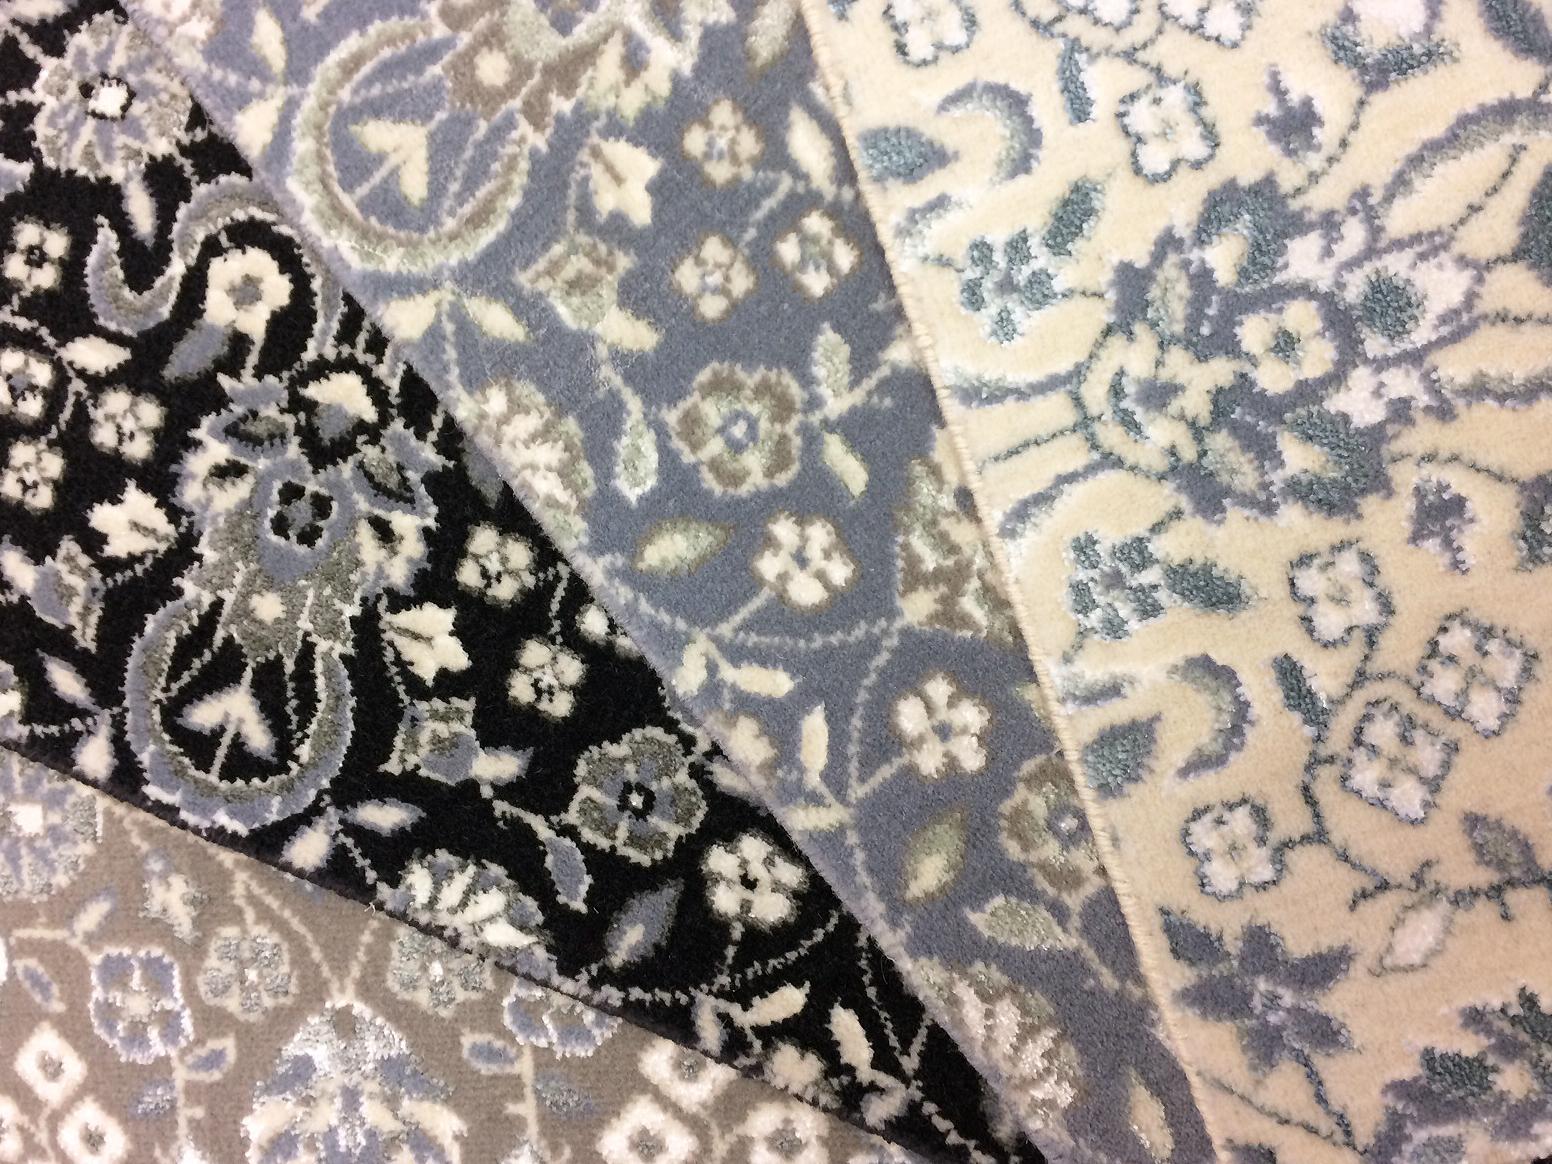 Oriental style carpet samples in grays